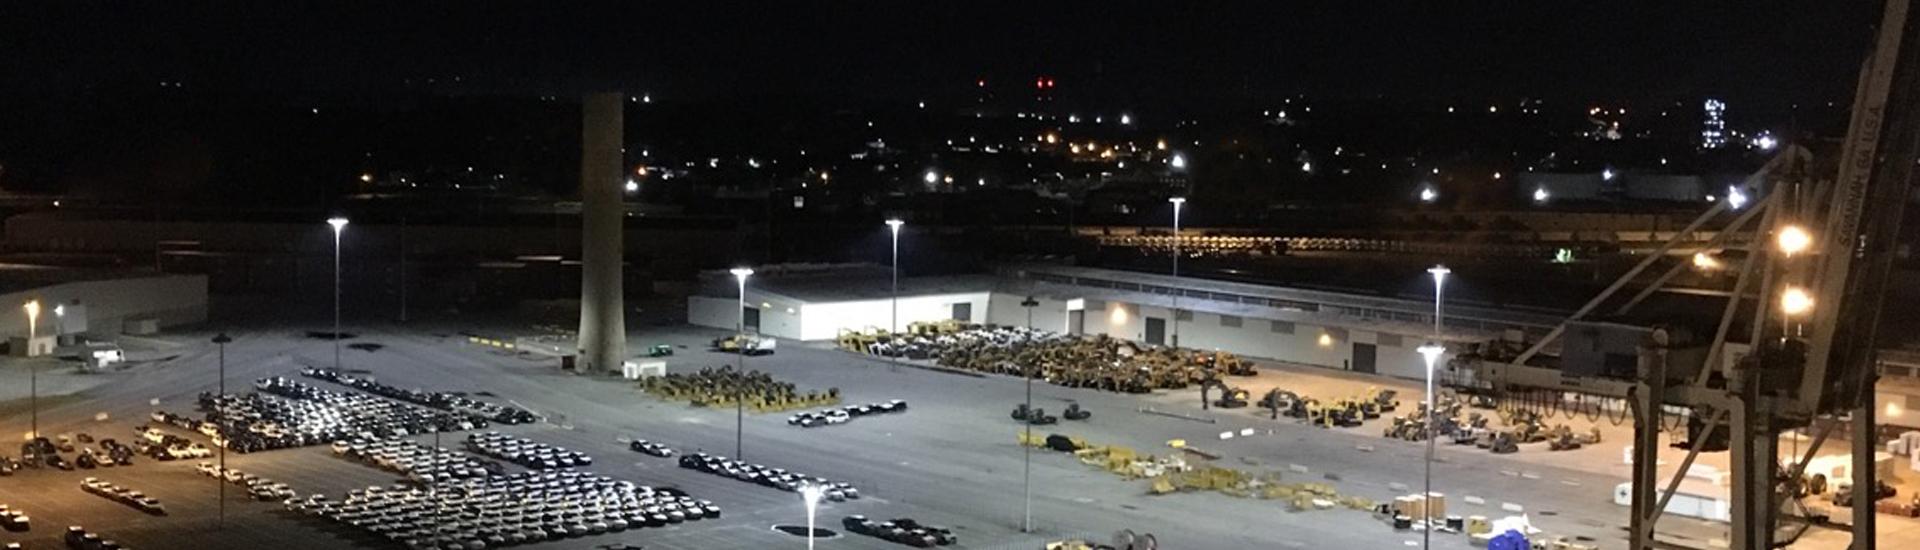 Port of Savannah Header Image